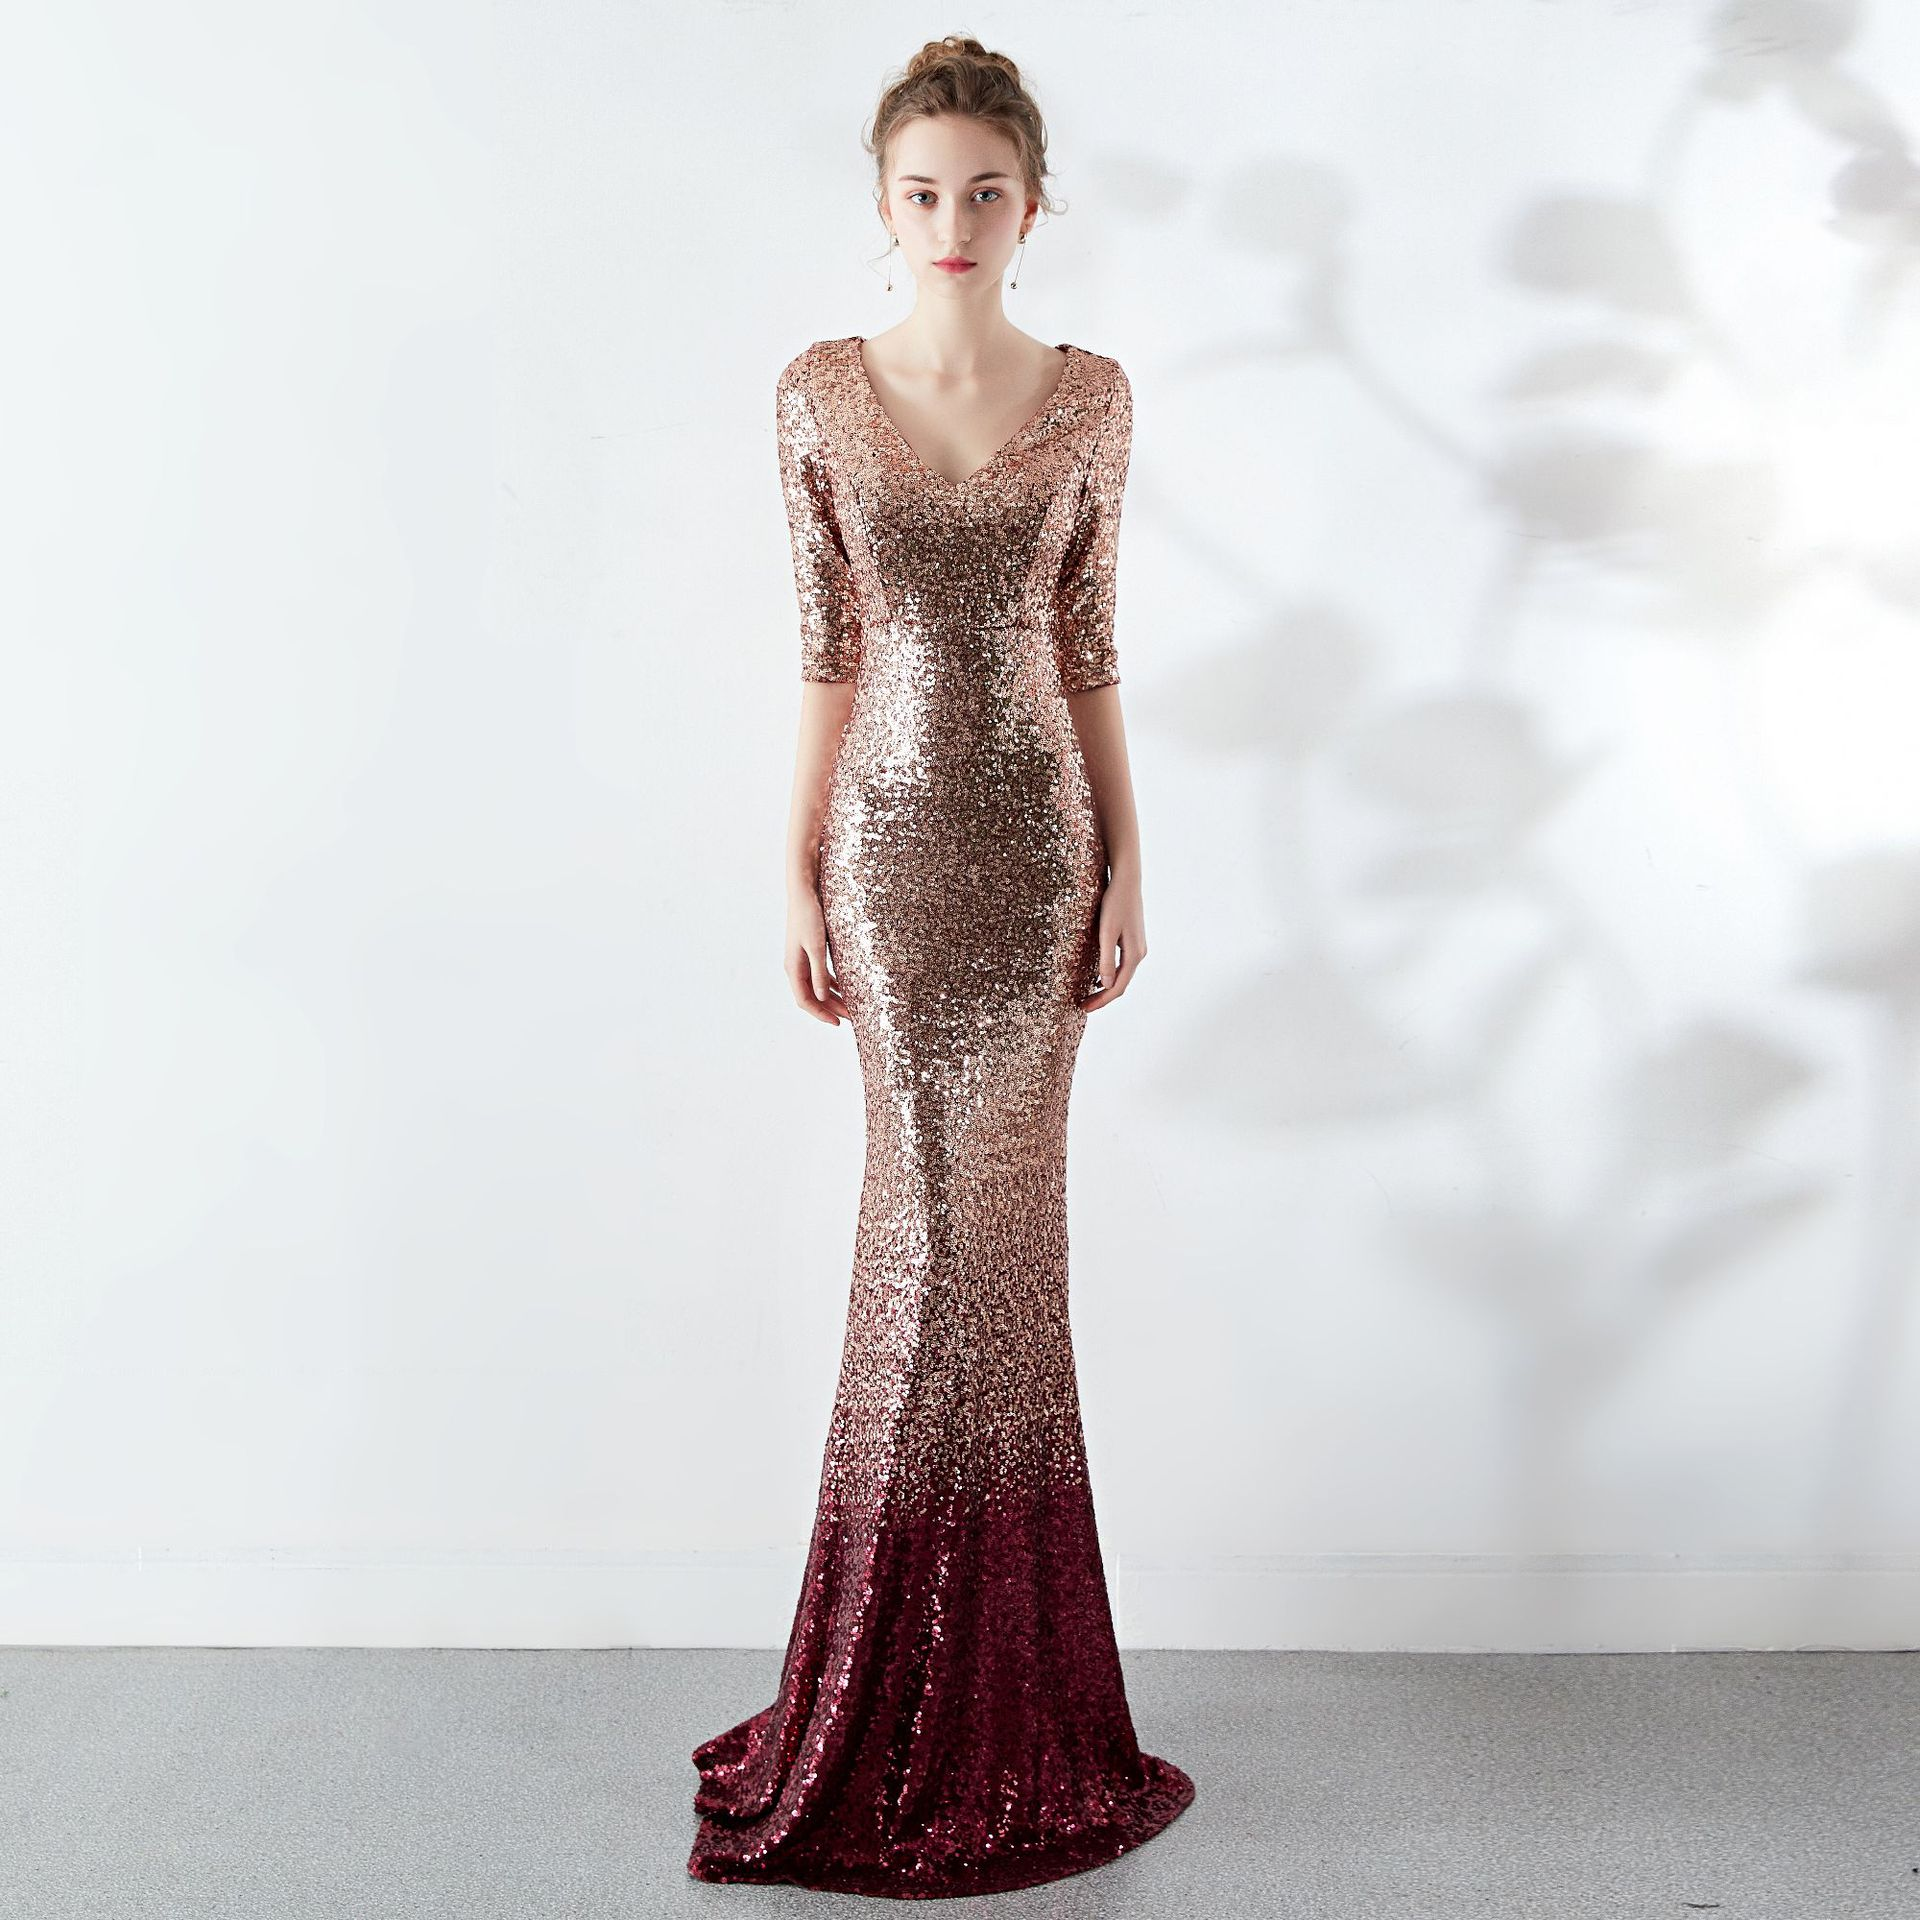 Robe De Soiree 2019 Sexy V-neck Half Sleeves Autumn Winter Mermaid Burgundy Long Evening Dresses Elegant Abendkleider ES2929-1